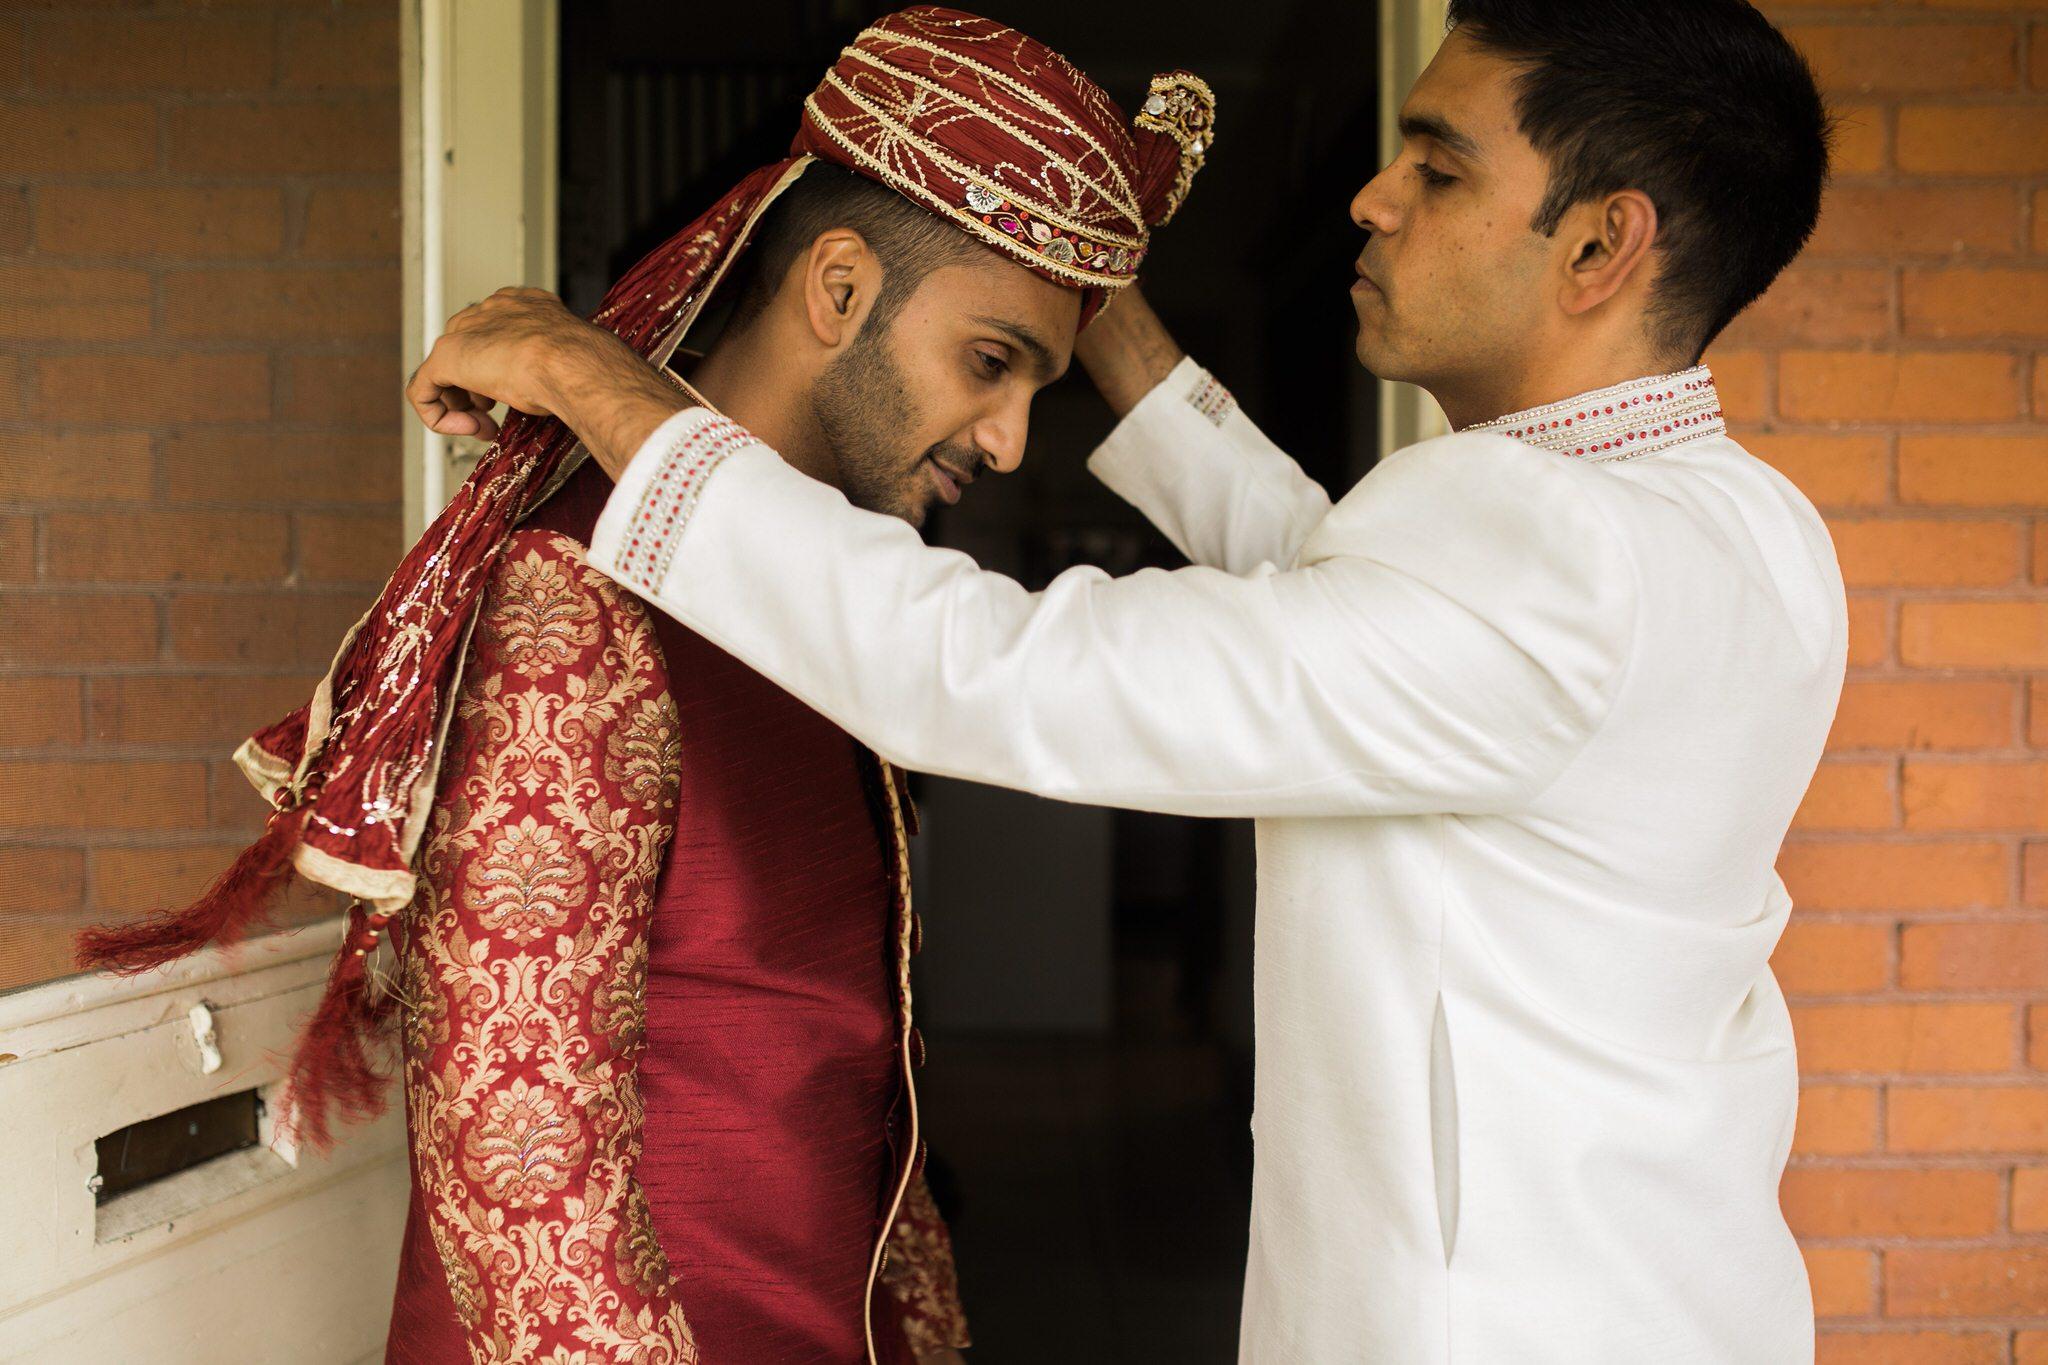 Northview Gardens Wedding - dressing the groom